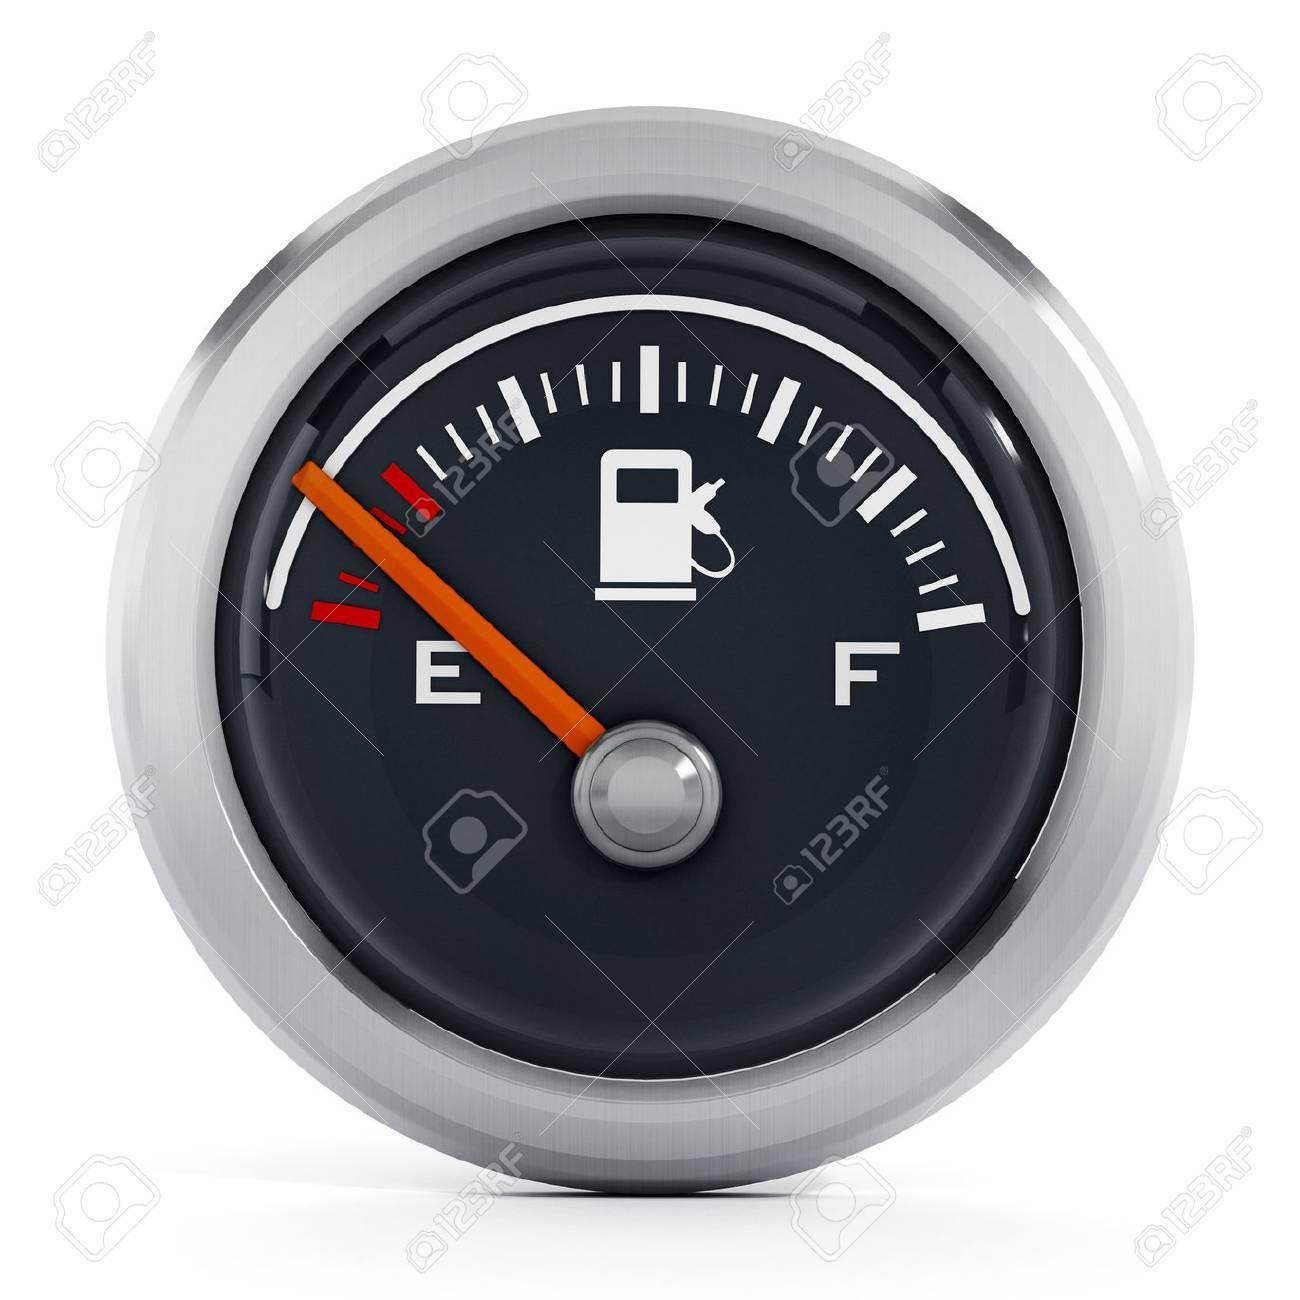 Fuel gauge with orange needle pointing empty Stock Photo - 50228587